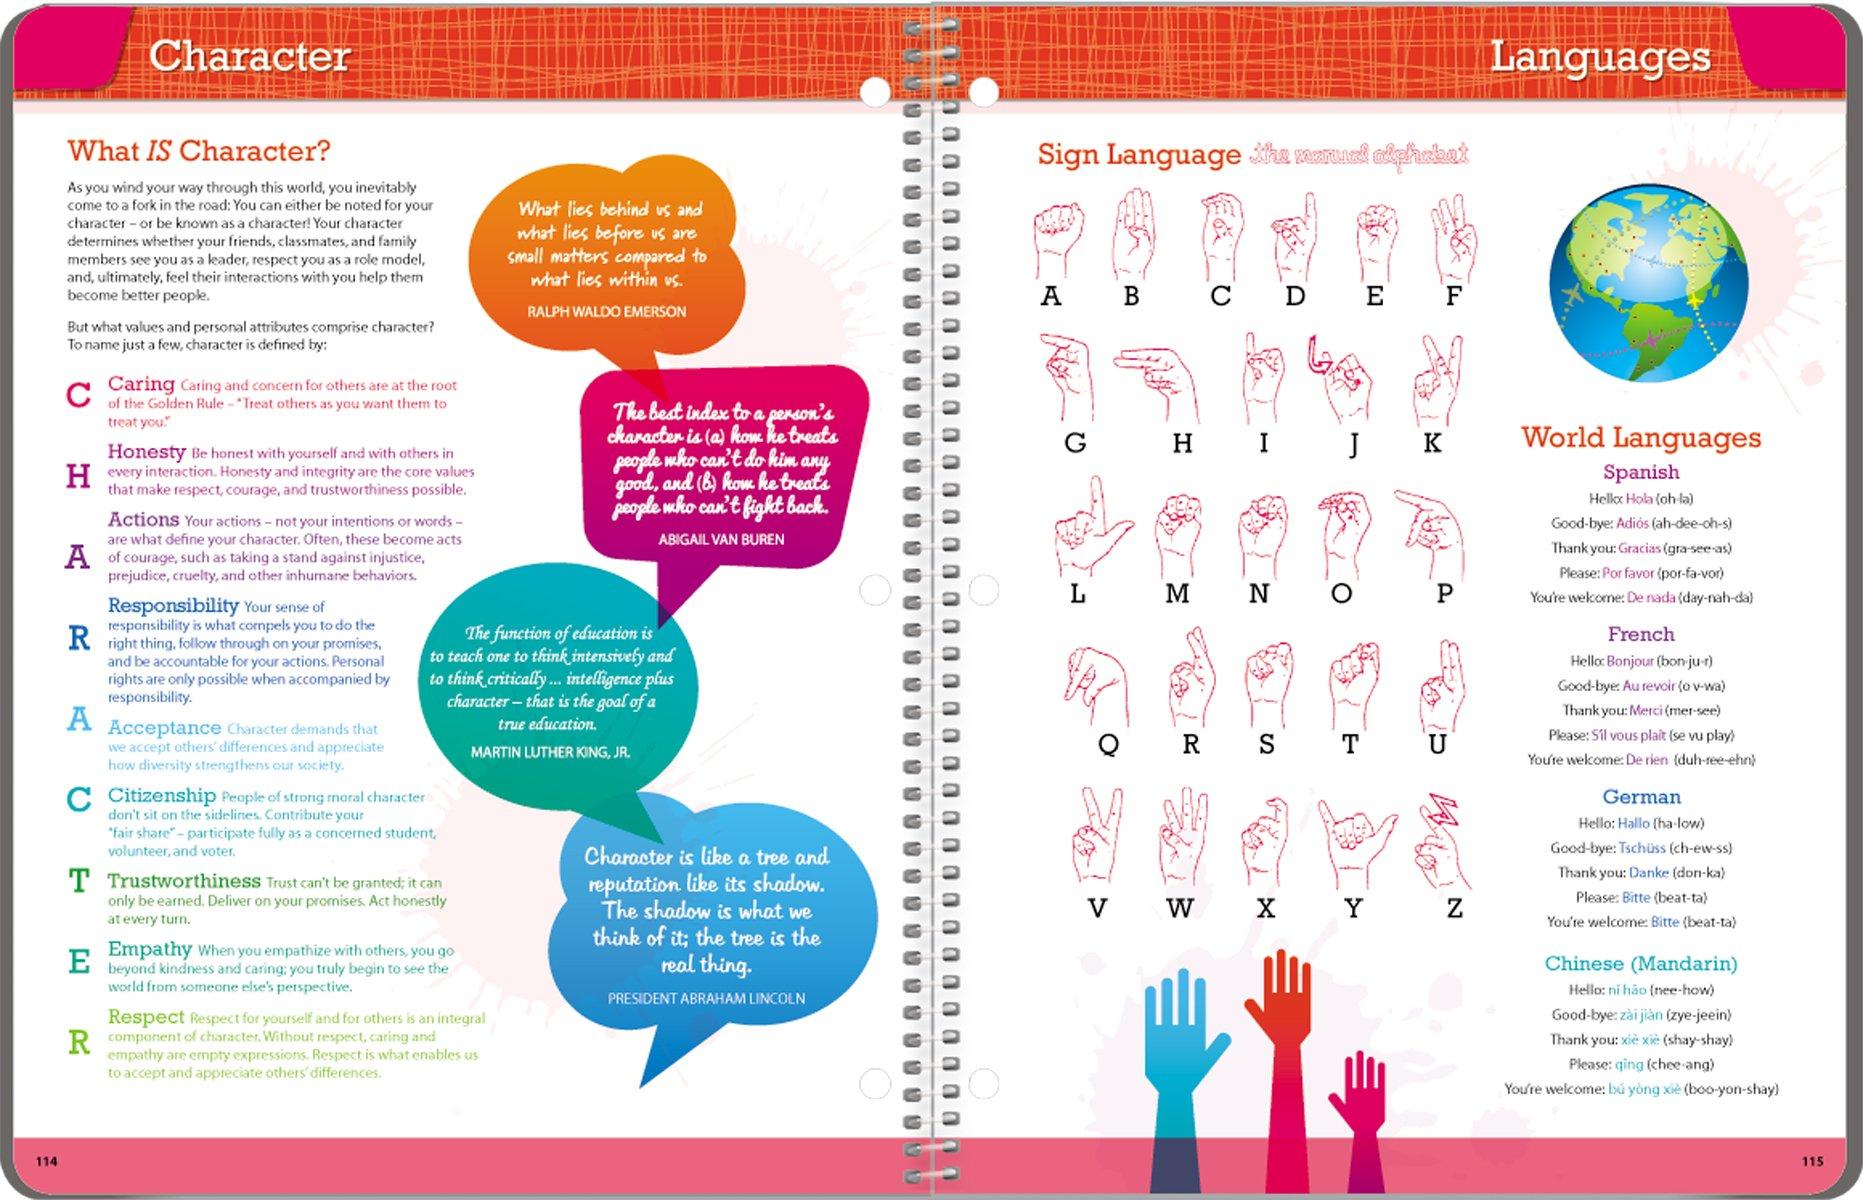 Student Planner 2016 - 2017 School Year Planner Elementary School Content 8.5'' x 11'' by School Datebooks (Image #6)